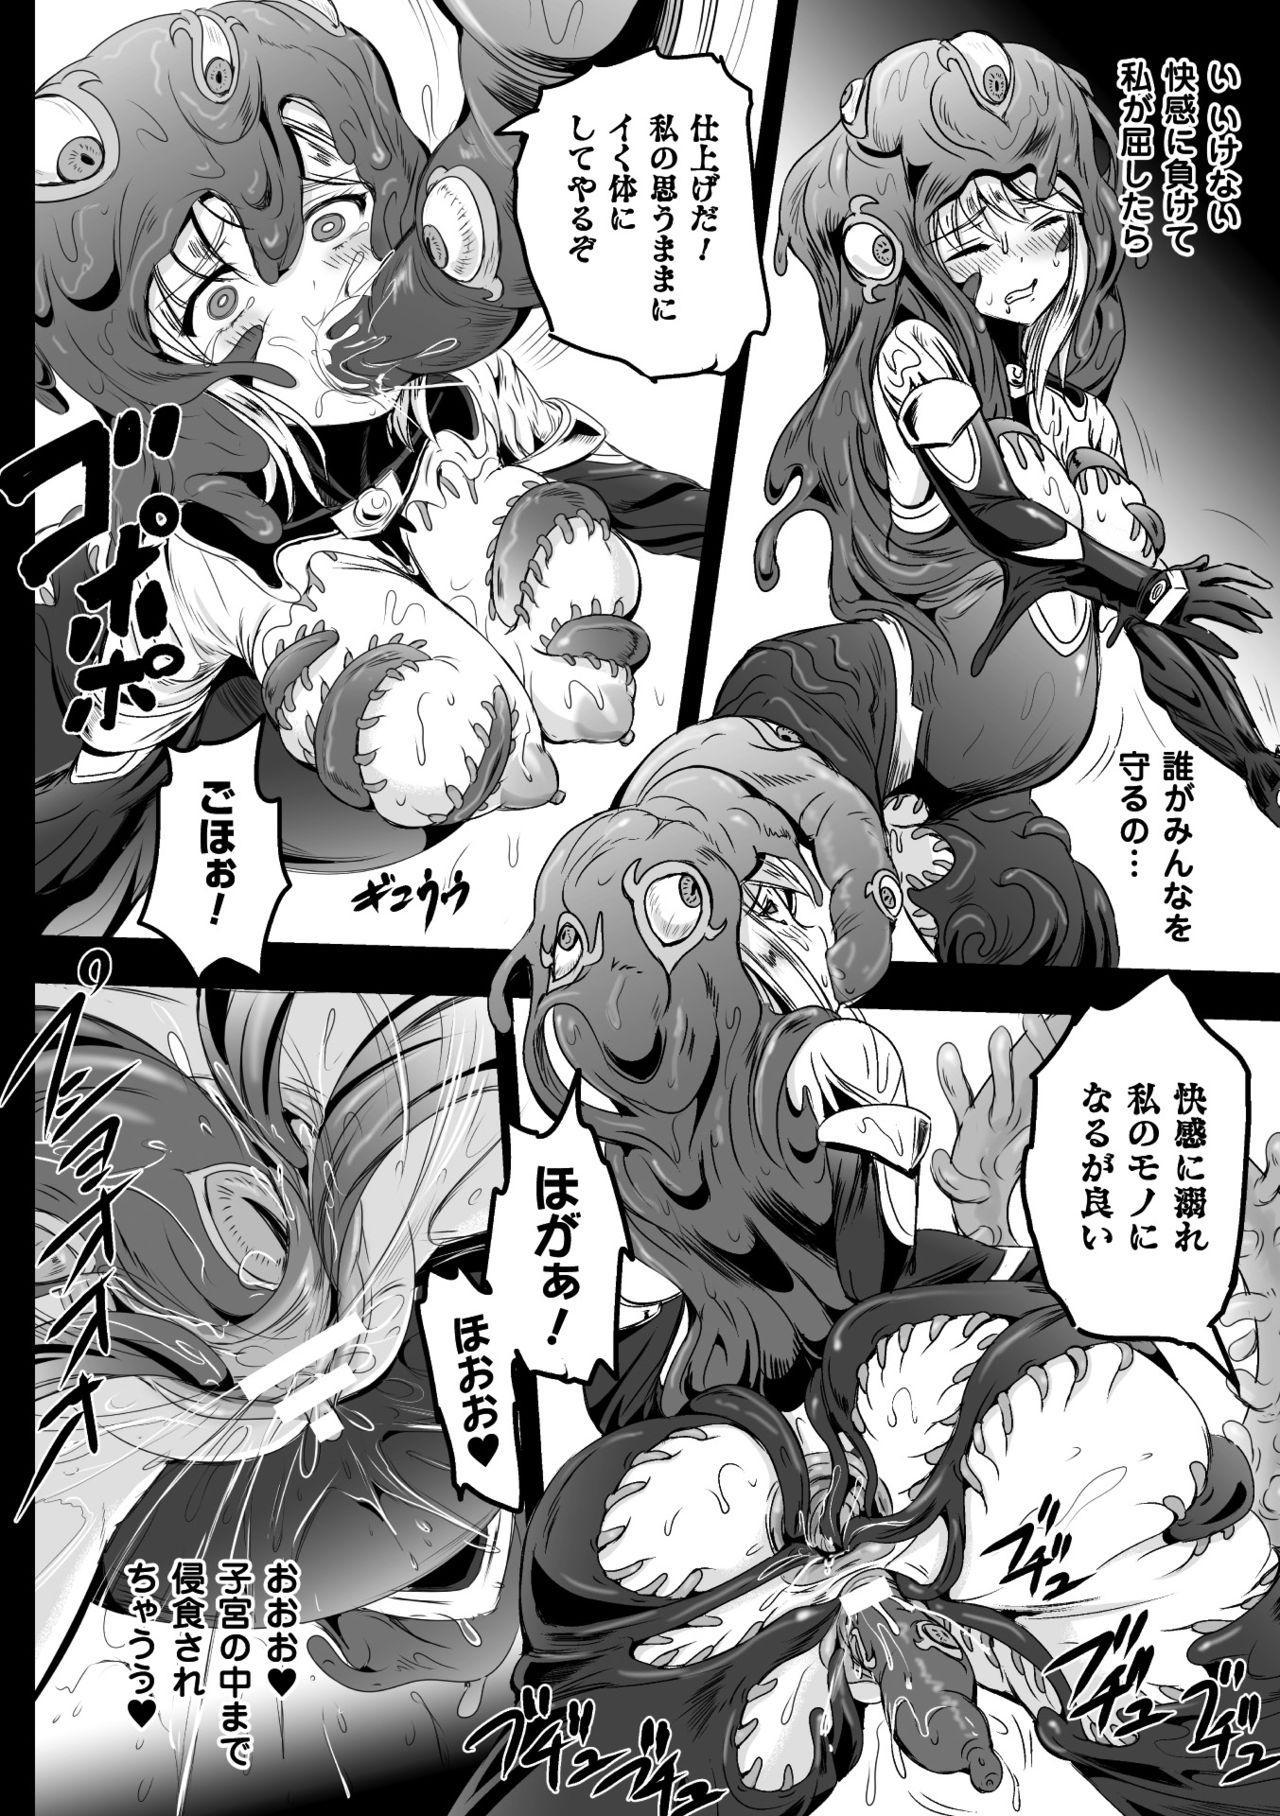 2D Comic Magazine Shokushu Yoroi ni Zenshin o Okasare Mugen Zecchou! Vol. 5 41